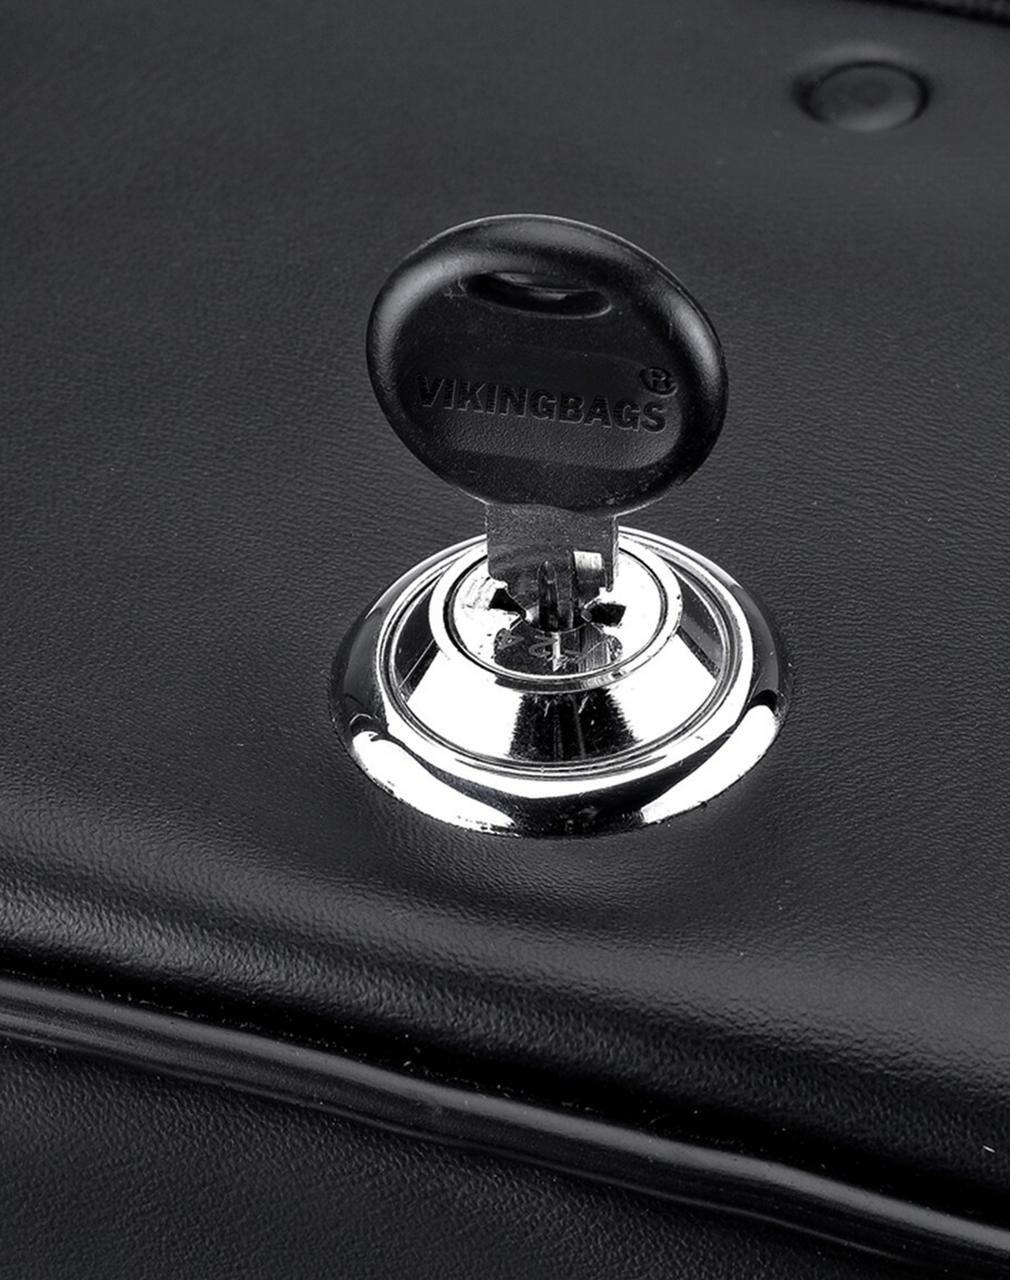 Honda VTX 1800 N Medium Charger Single Strap Motorcycle Saddlebags Key Lock View